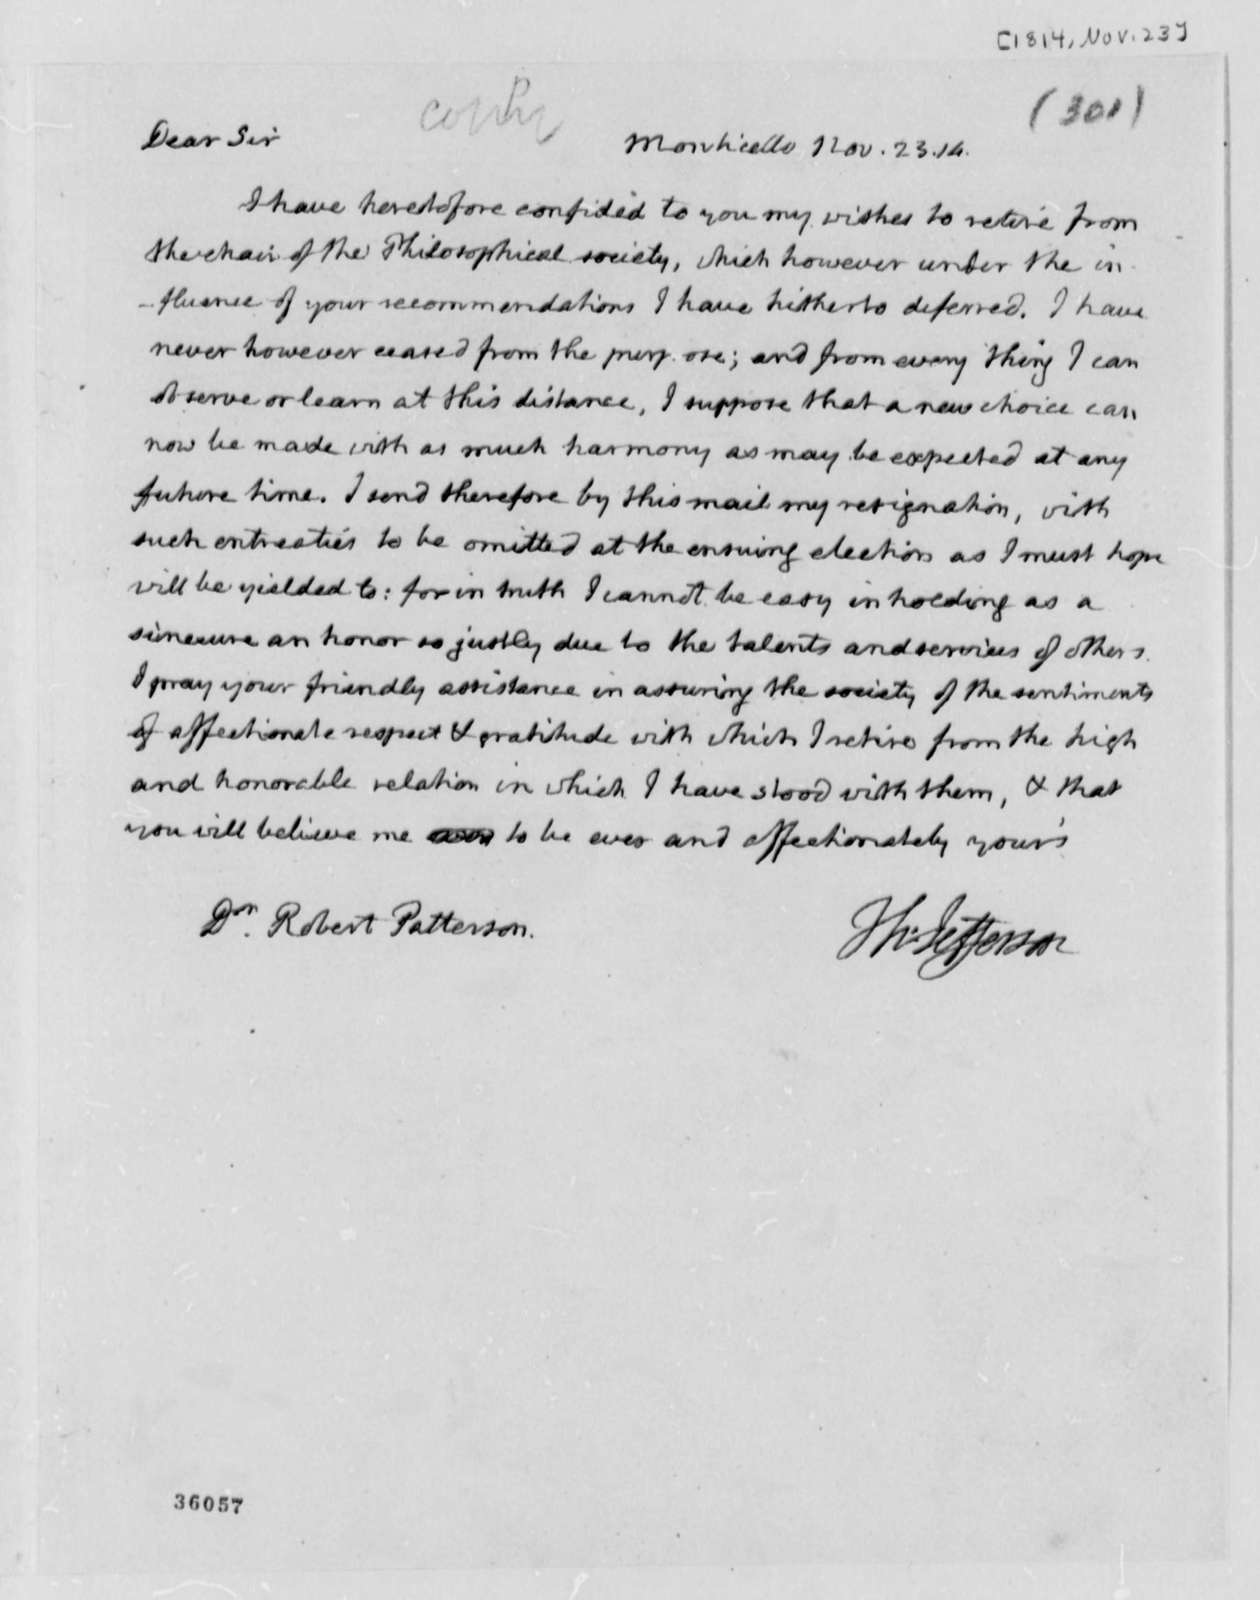 Thomas Jefferson to Robert Patterson, November 23, 1814